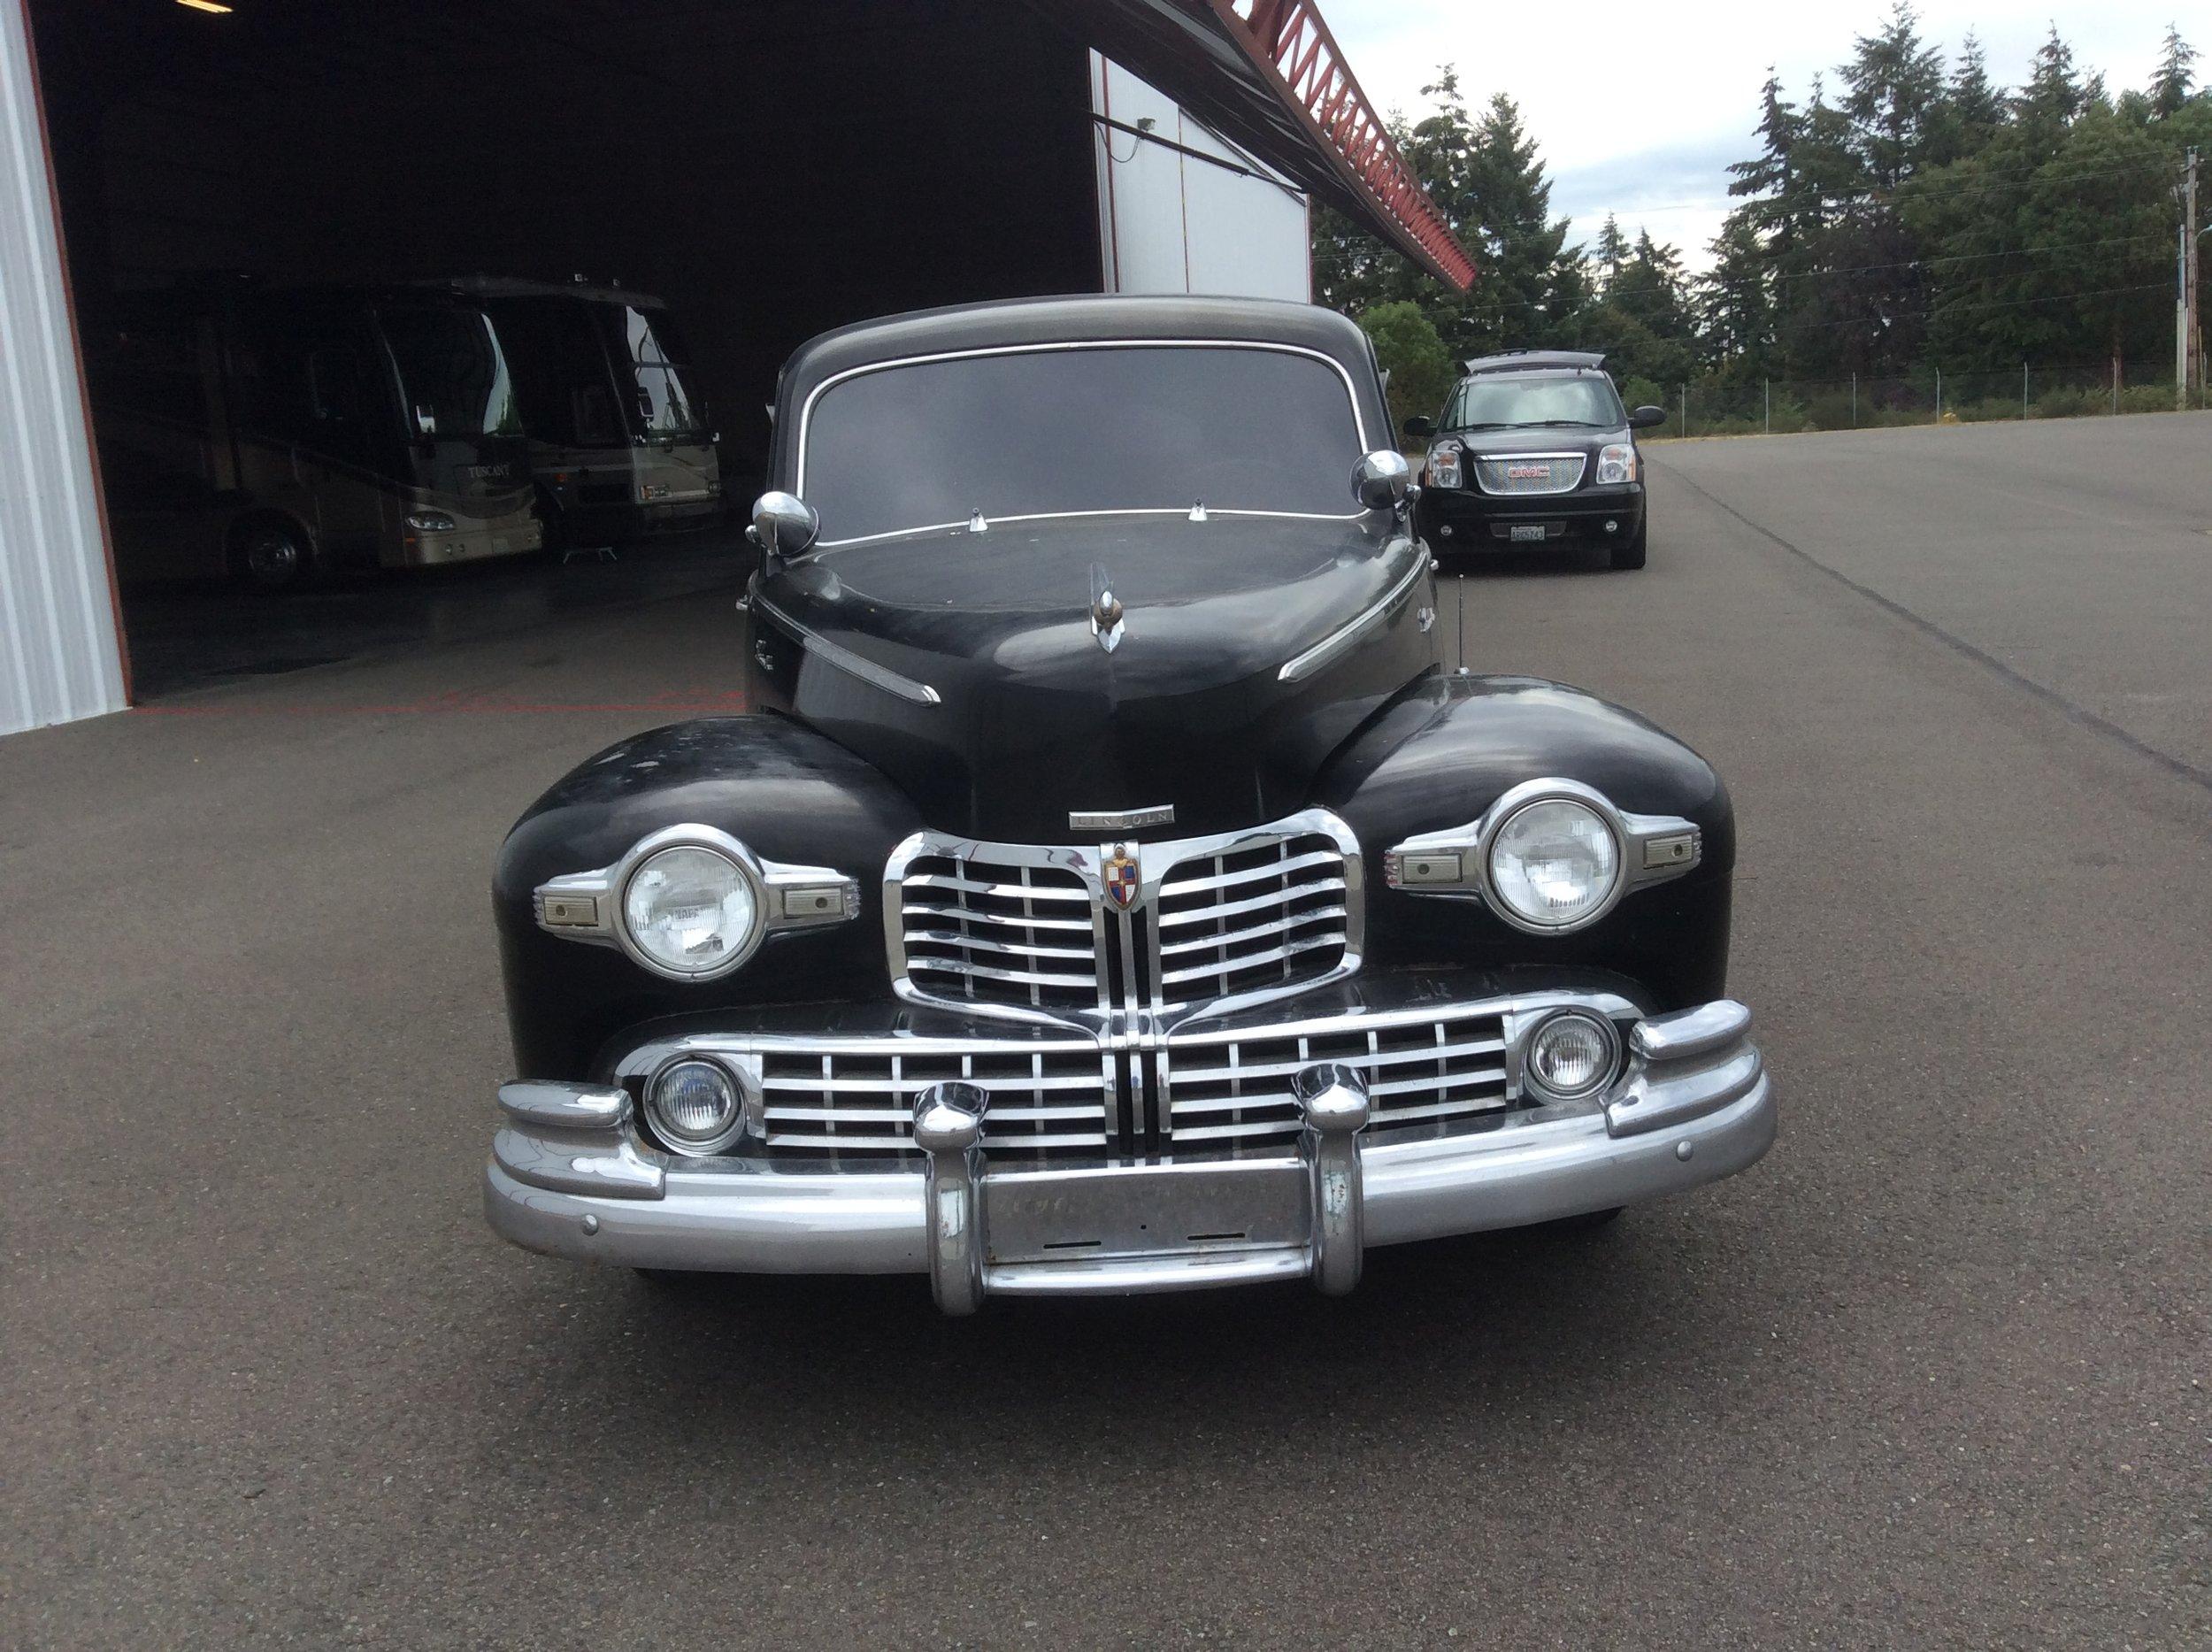 1948 Lincoln Zephyr (238).JPG